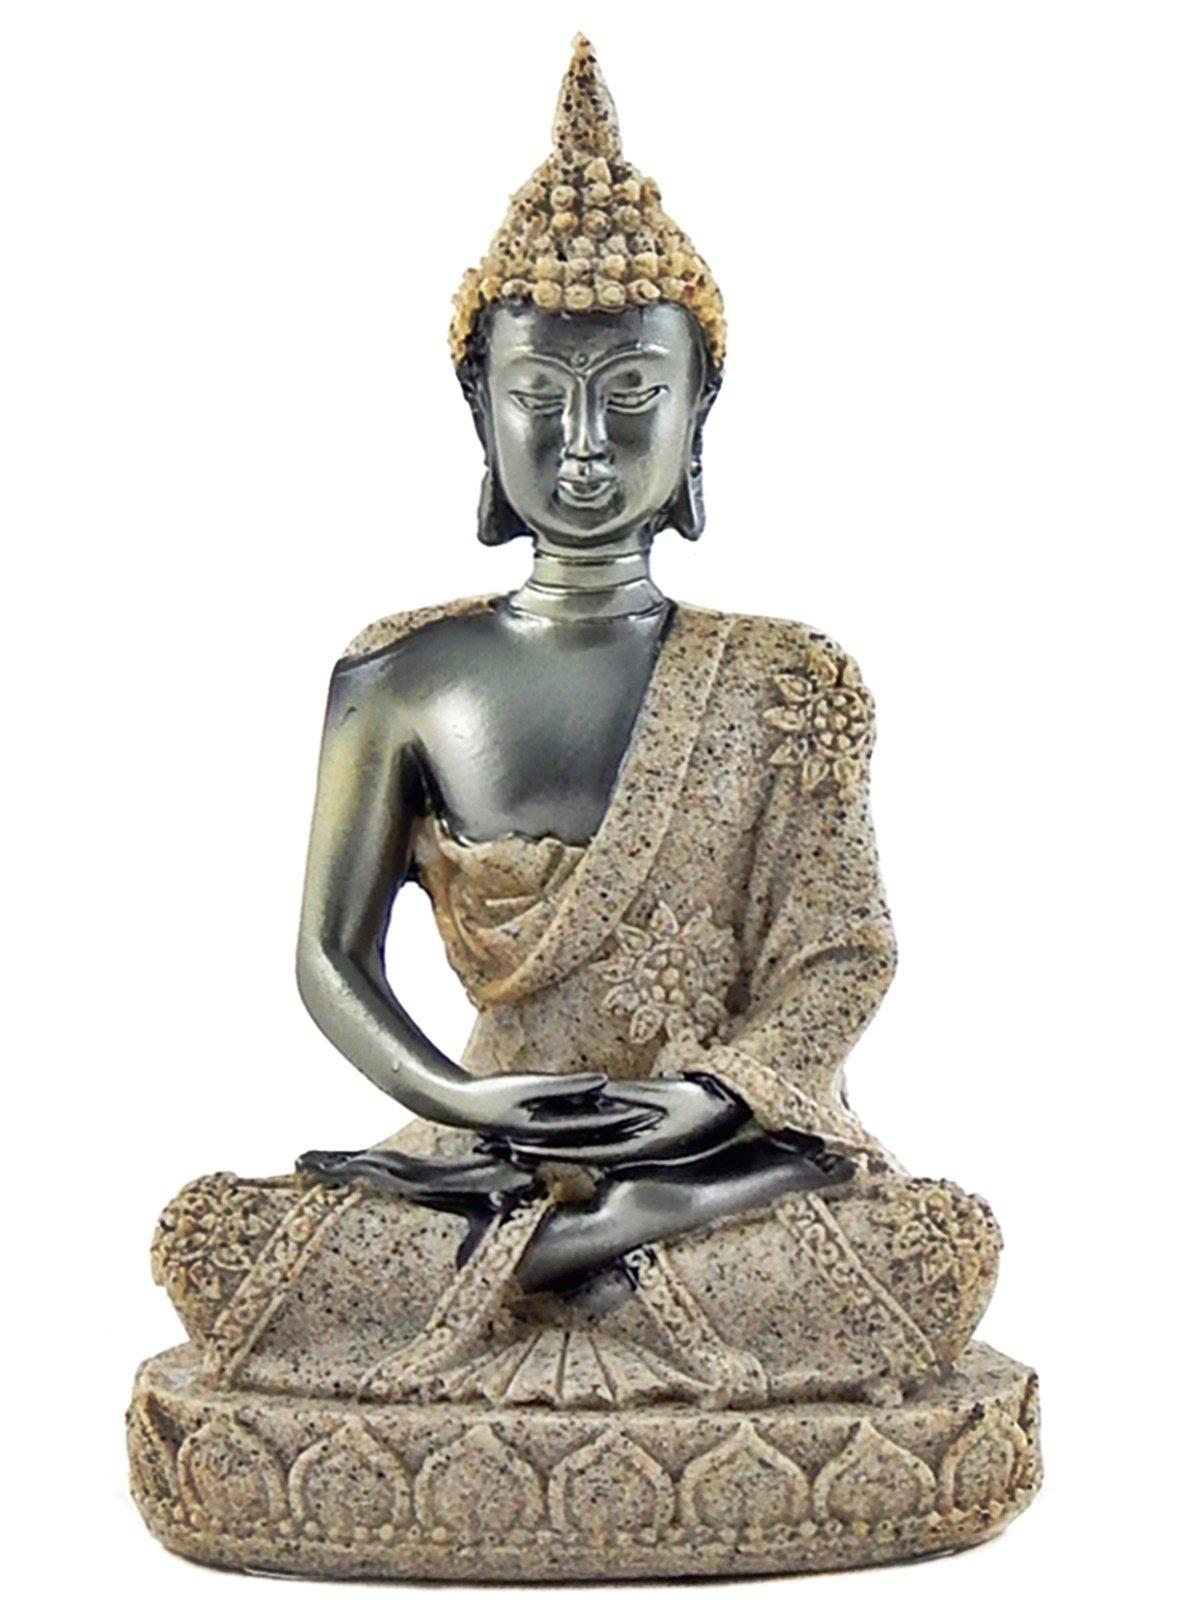 Bellaa 23637 Buddha Statue Blessing Zen Meditating Thai Peace Harmony